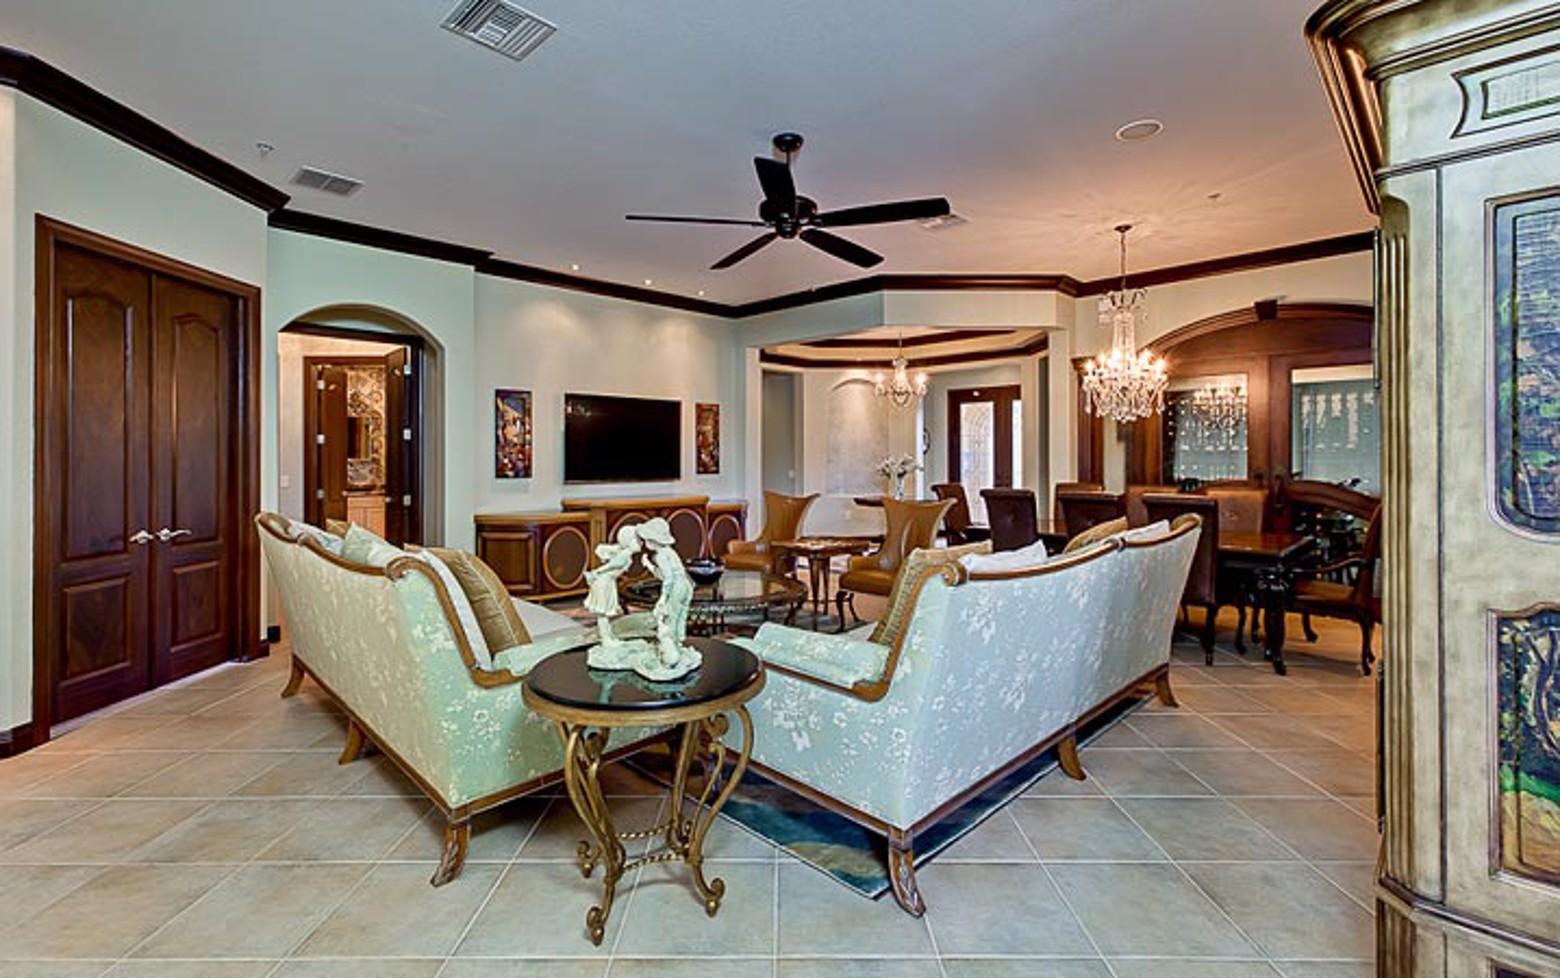 Romantic Florida Coach Home image